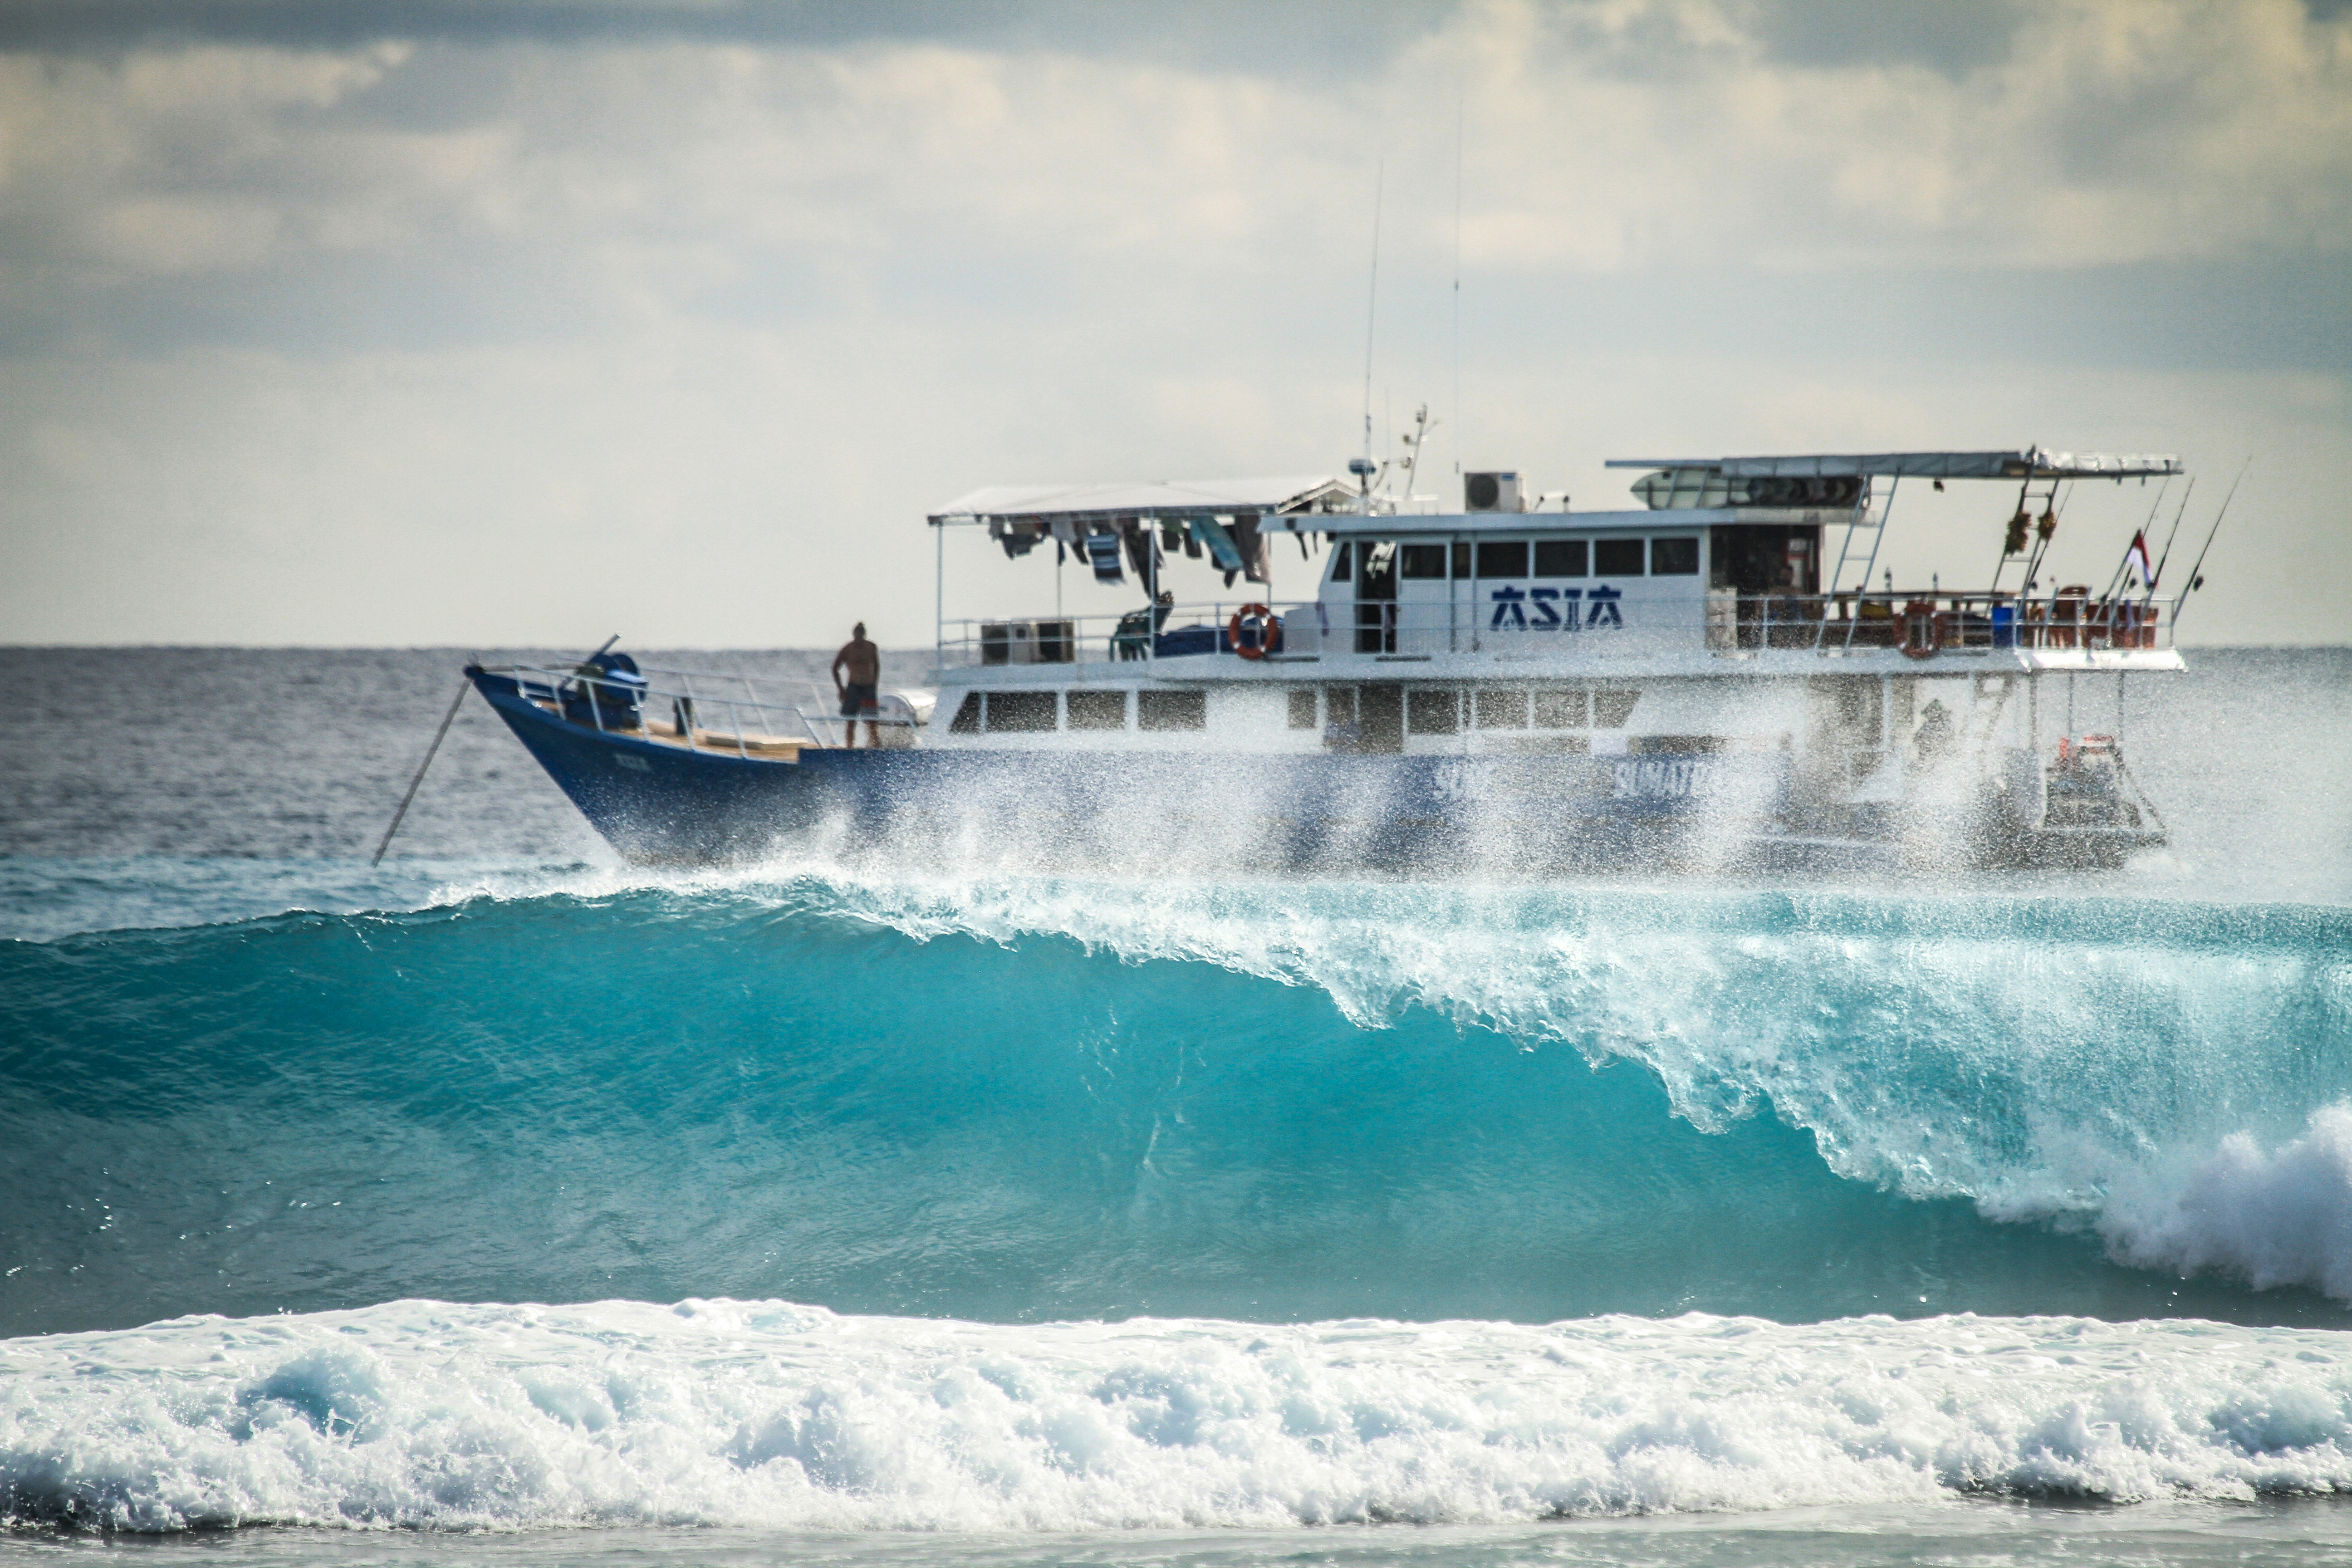 ASIA Boat Surf Charter Mentawai In Surfs.png